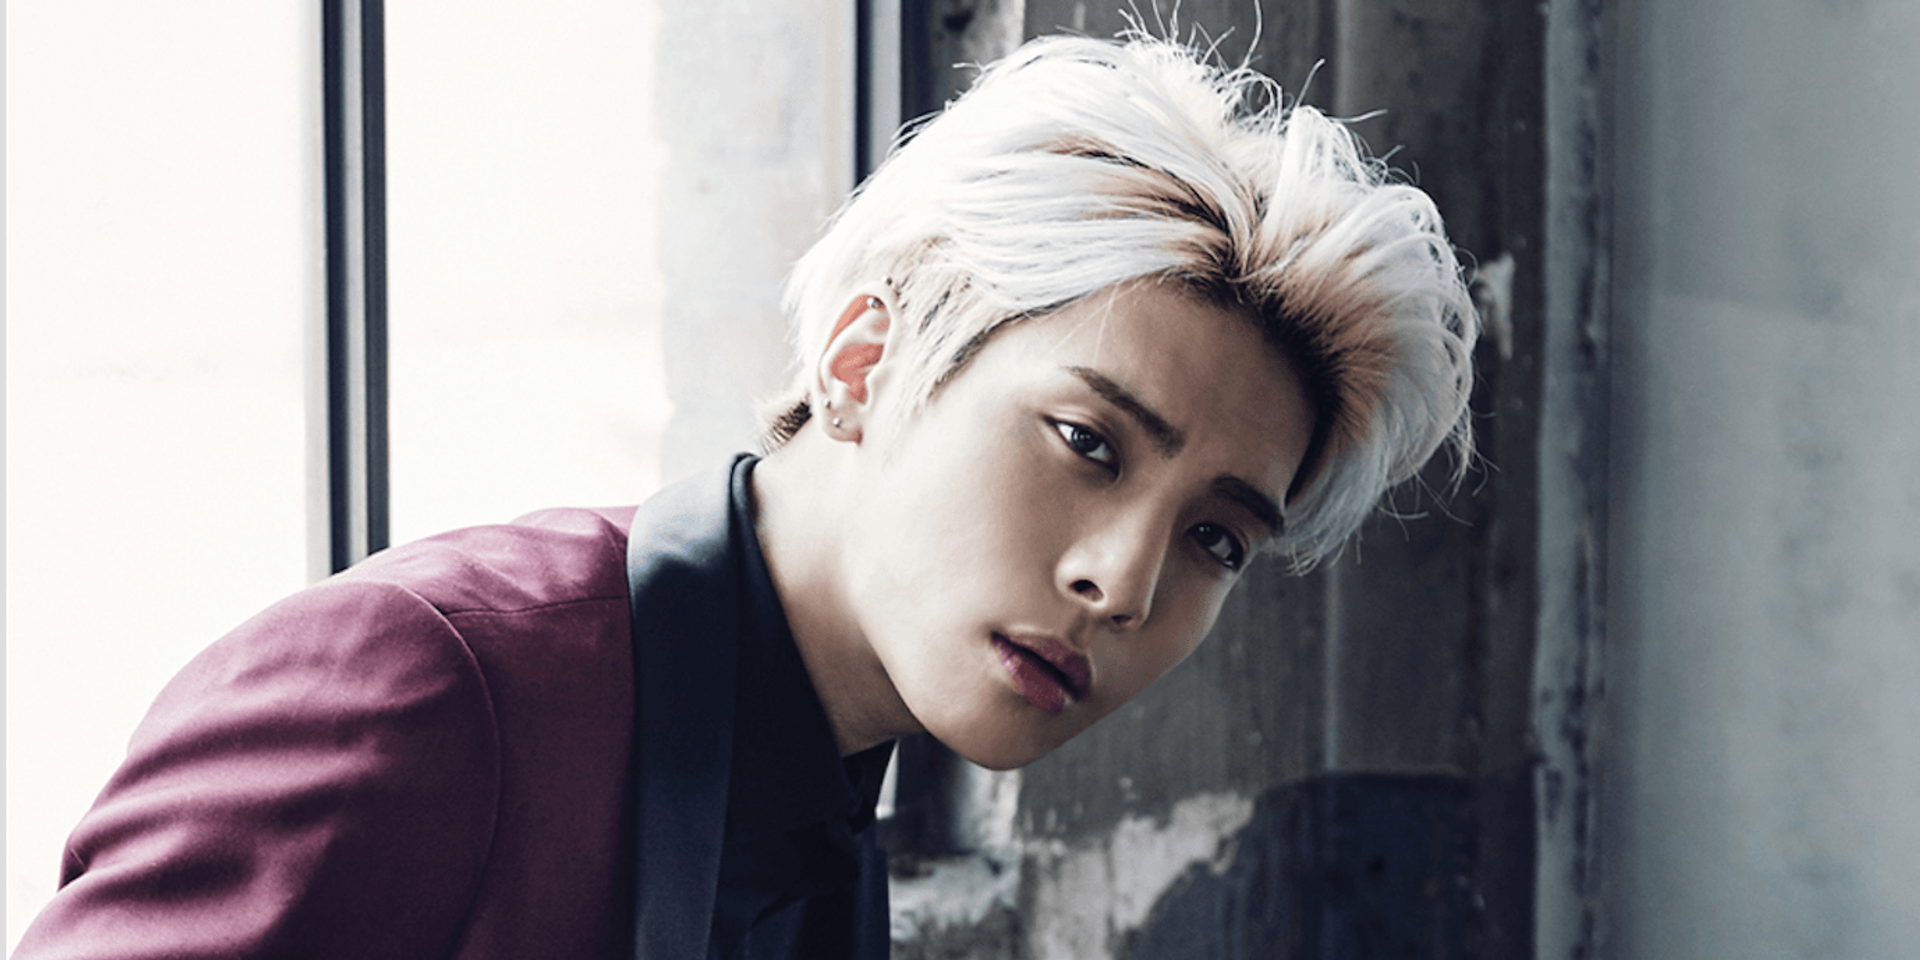 SHINee lead vocalist Jonghyun passes away at 27